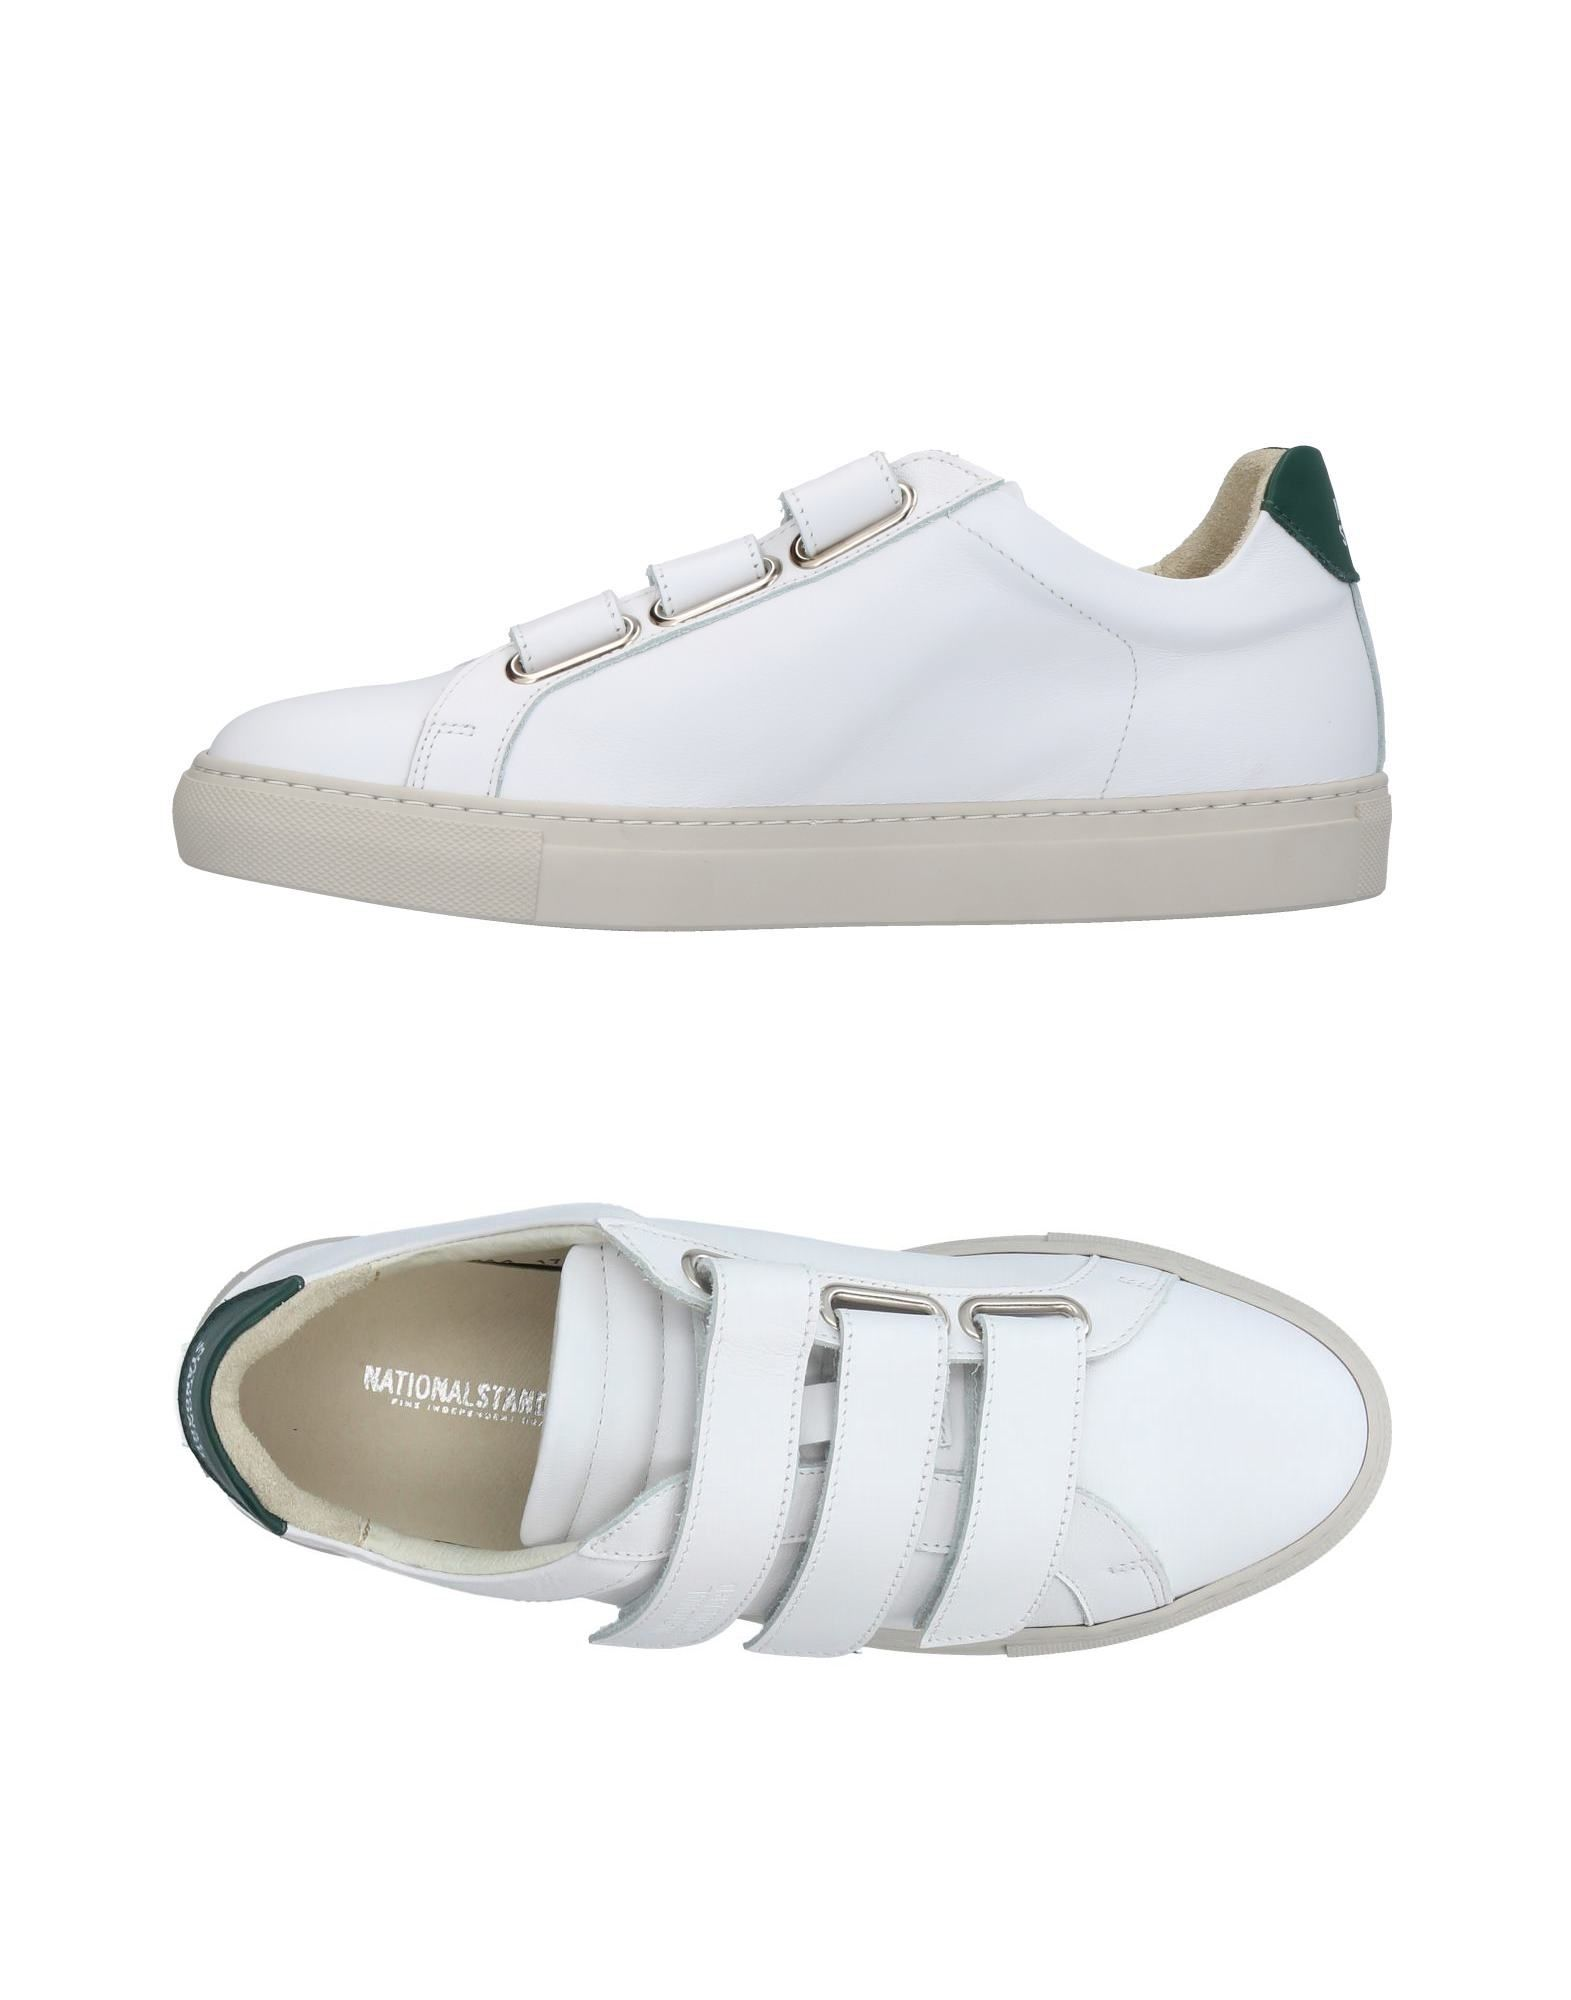 Sneakers National Standard Homme - Sneakers National Standard  Blanc Dédouanement saisonnier